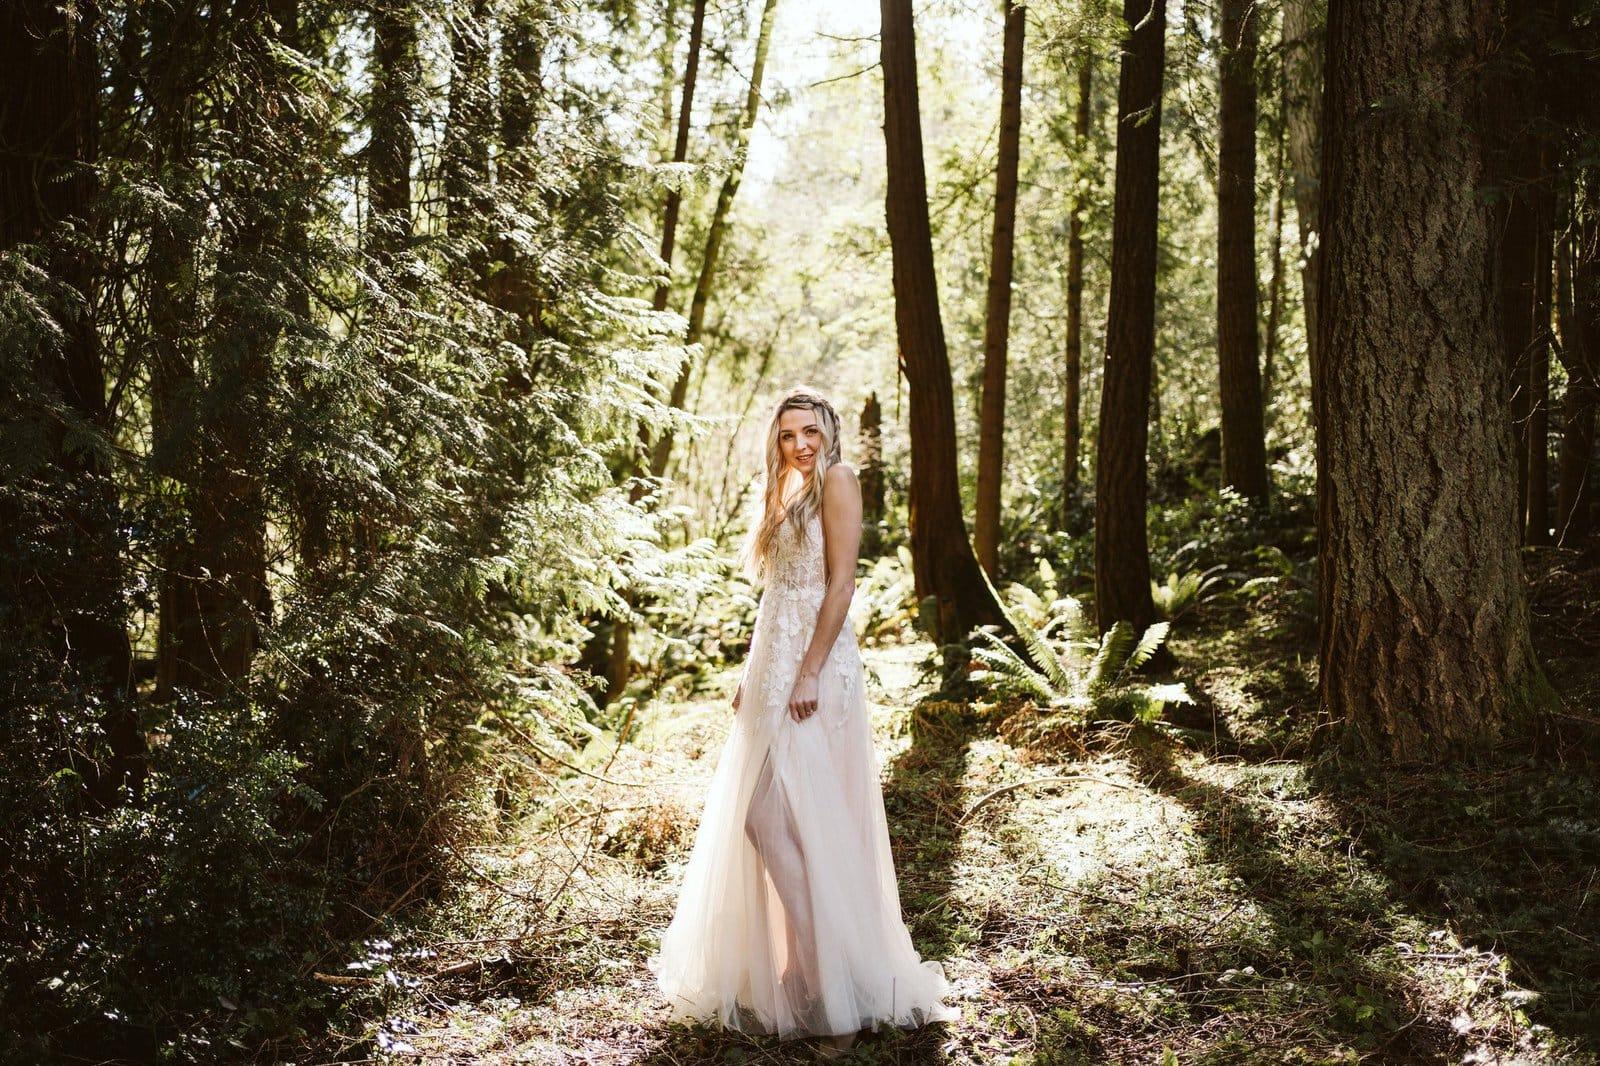 Essense of Australia D2840 style on bride